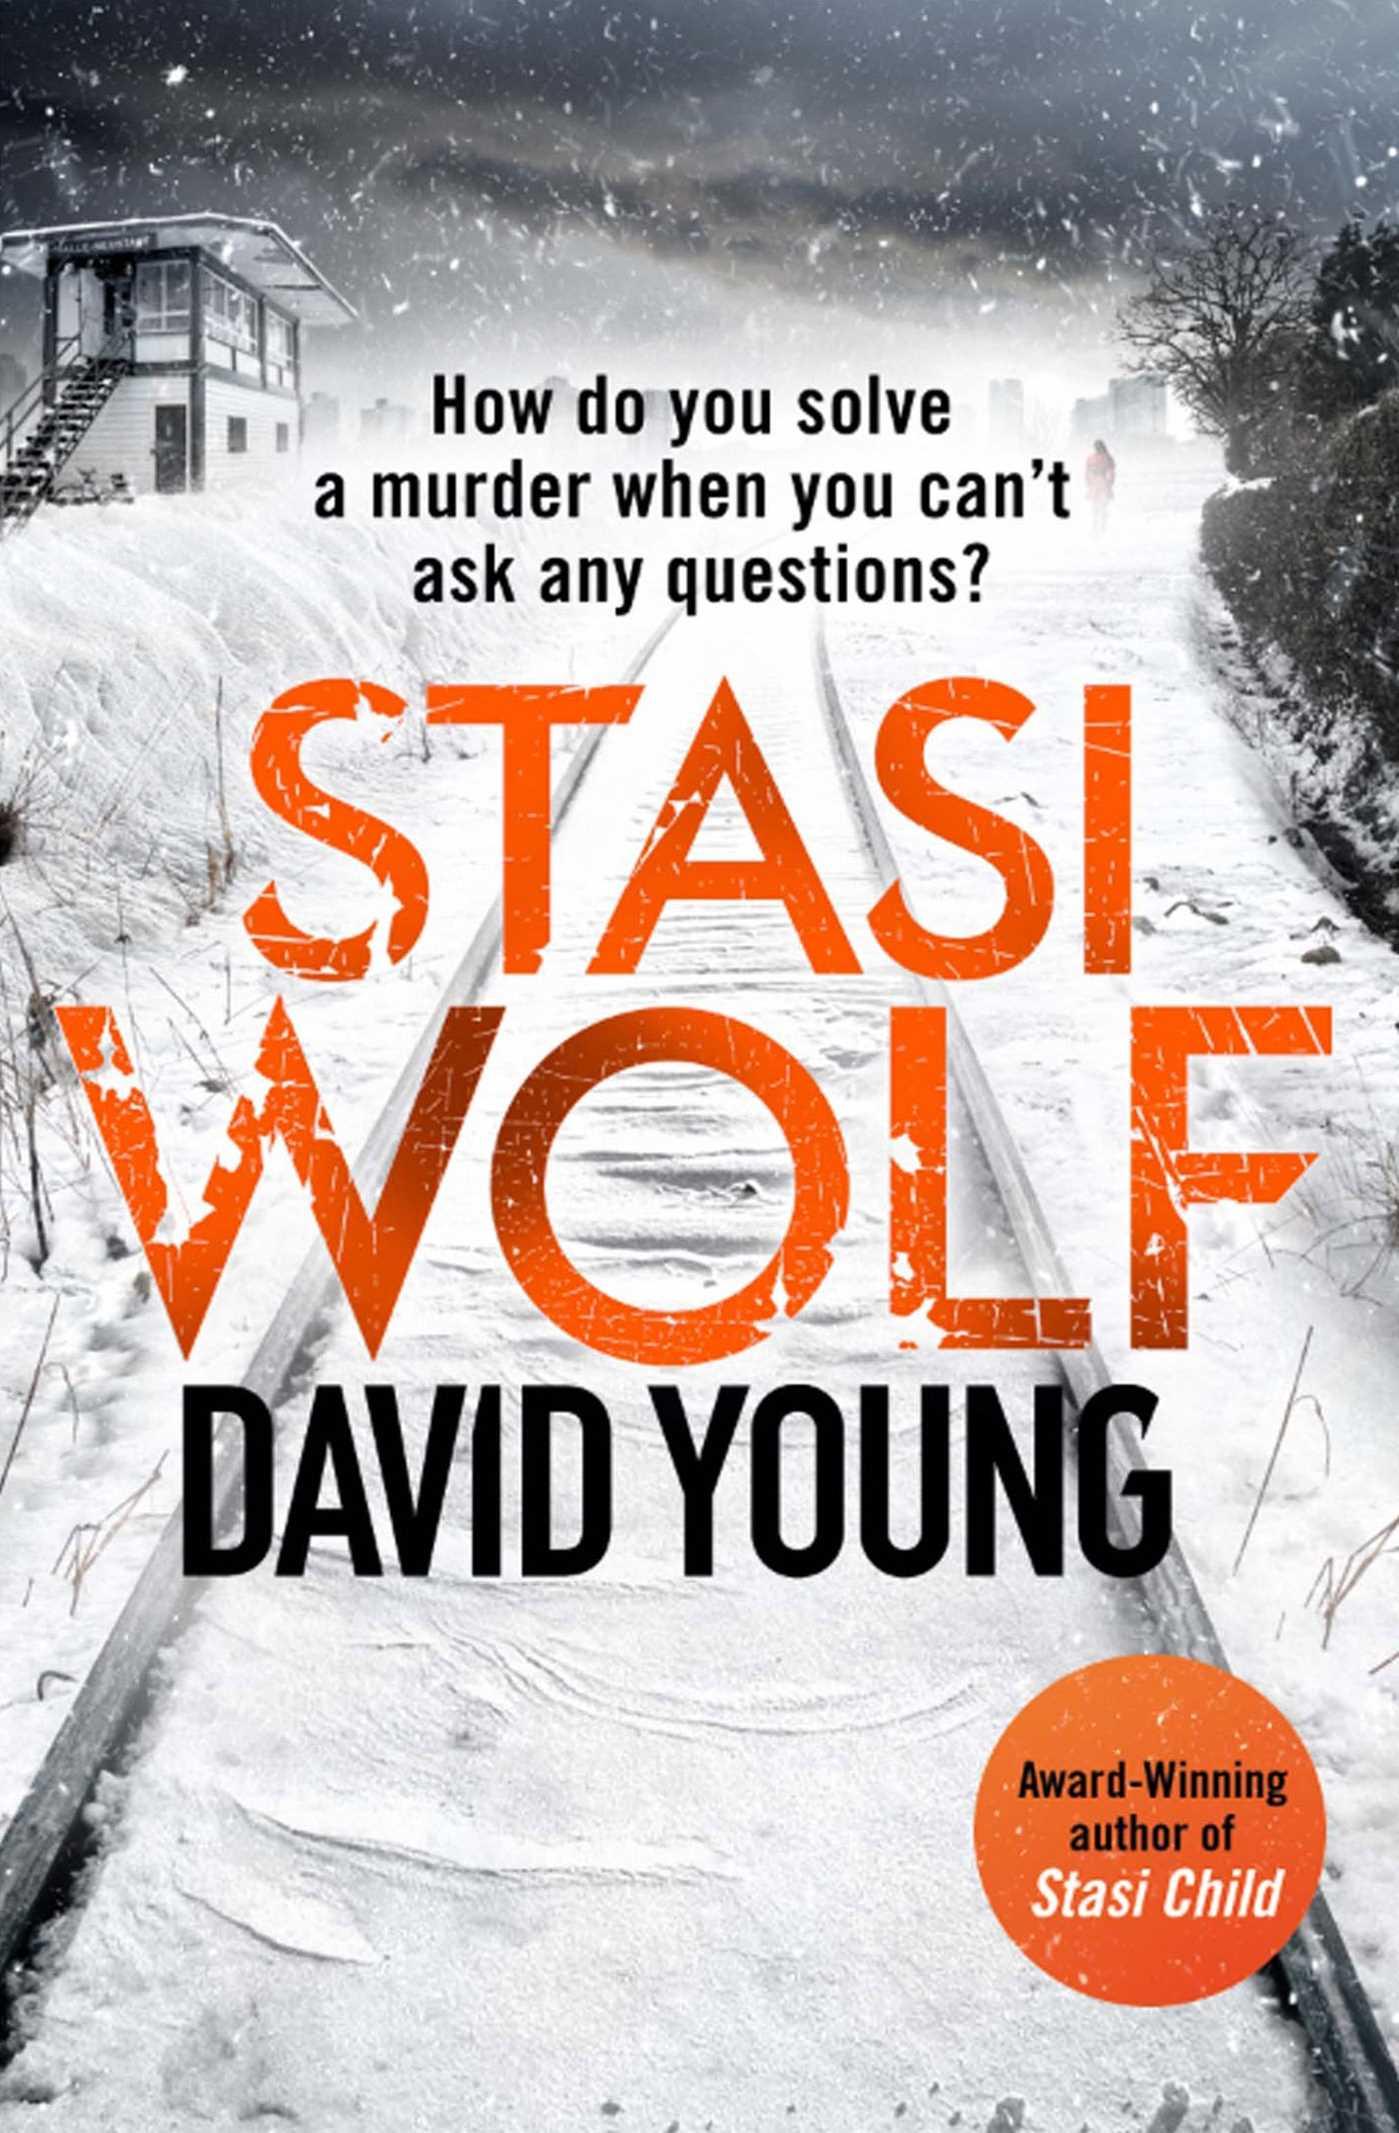 Stasi wolf 9781499861891 hr